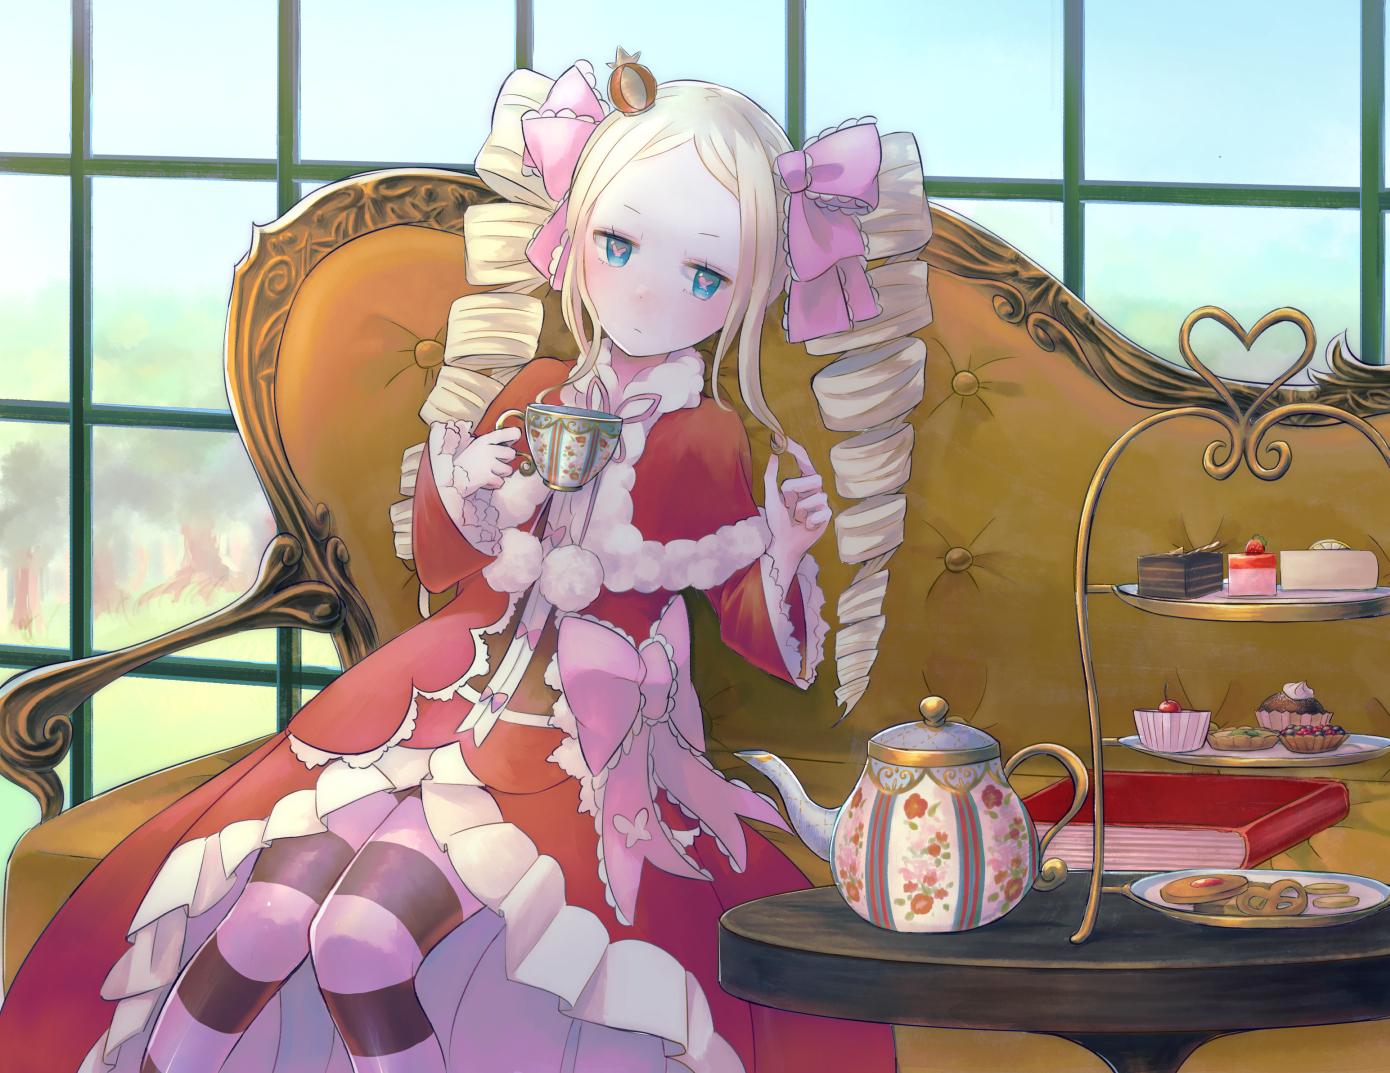 Yellow-haired anime character, Beatrice (Re: Zero